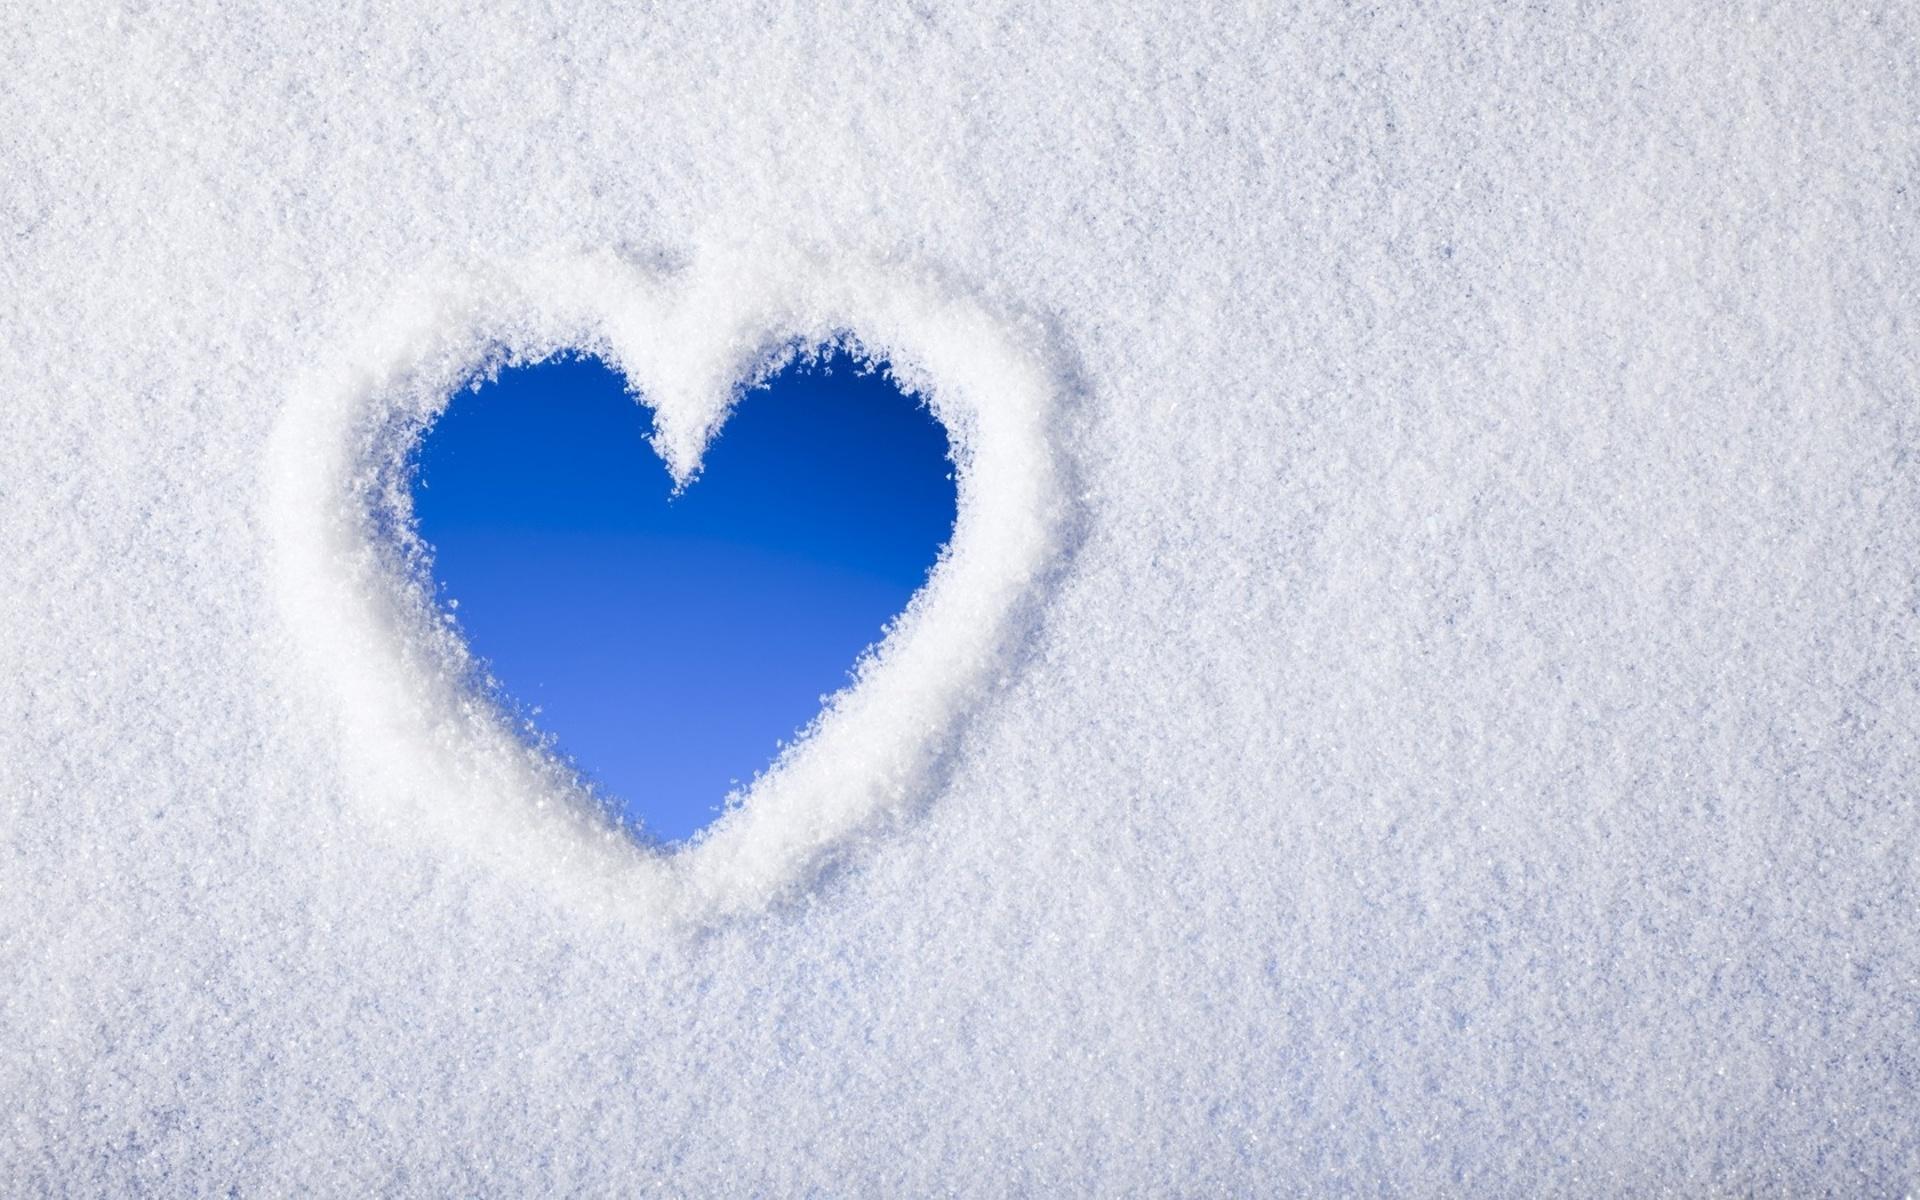 Snow Heart Hd Wallpaper